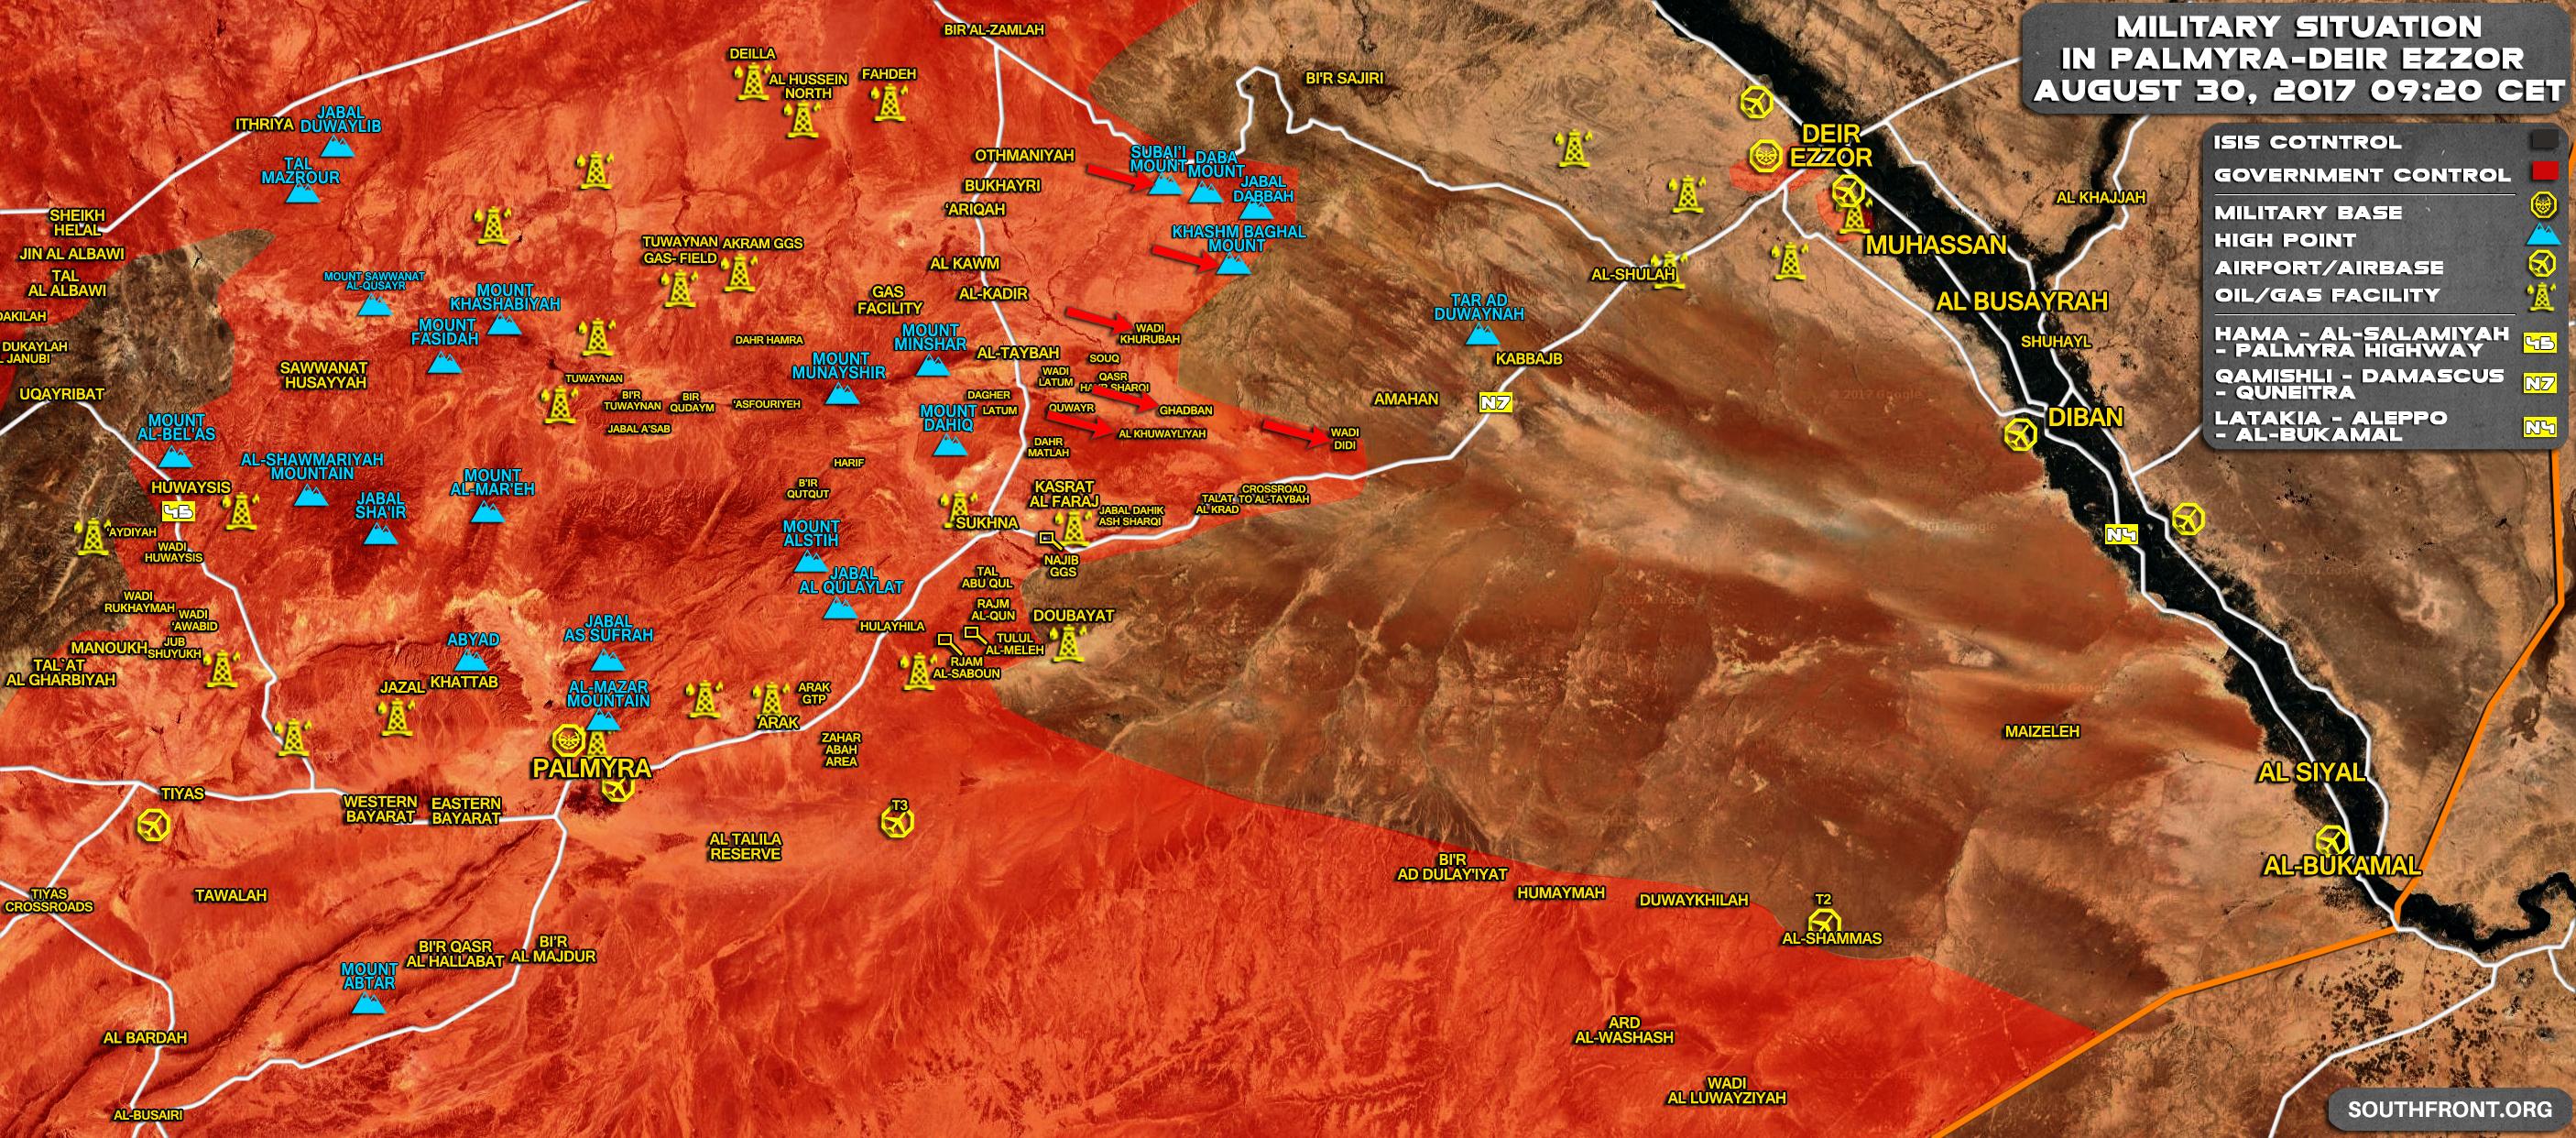 30aug_Palmyra_Deir_Ezzor_Syria_War_Map-Recovered